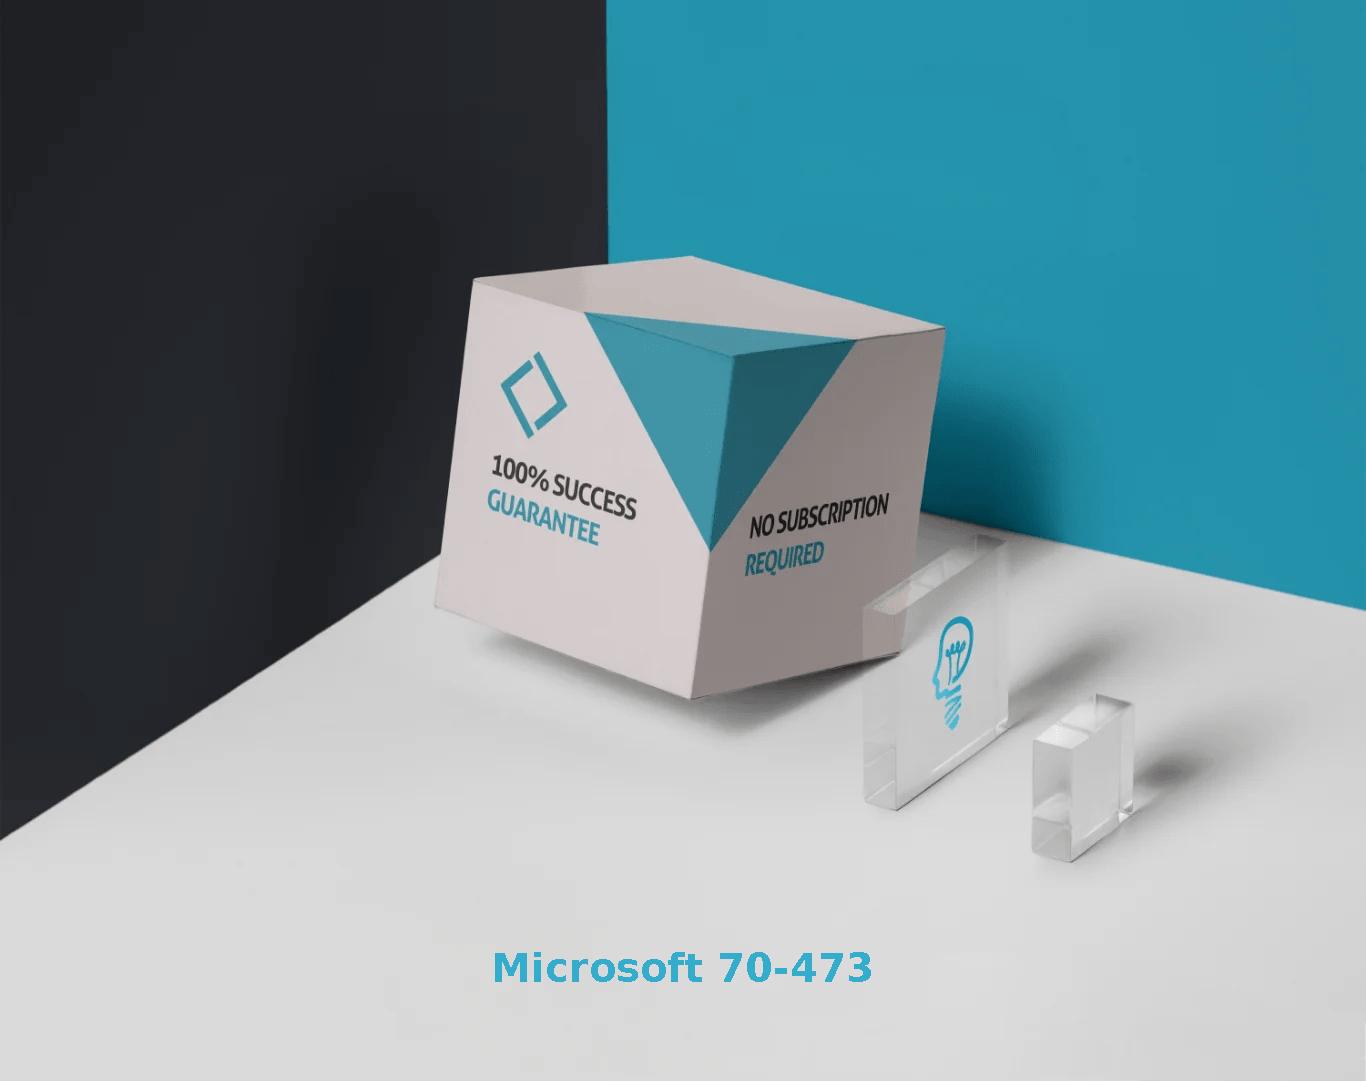 Microsoft 70-473 Exams